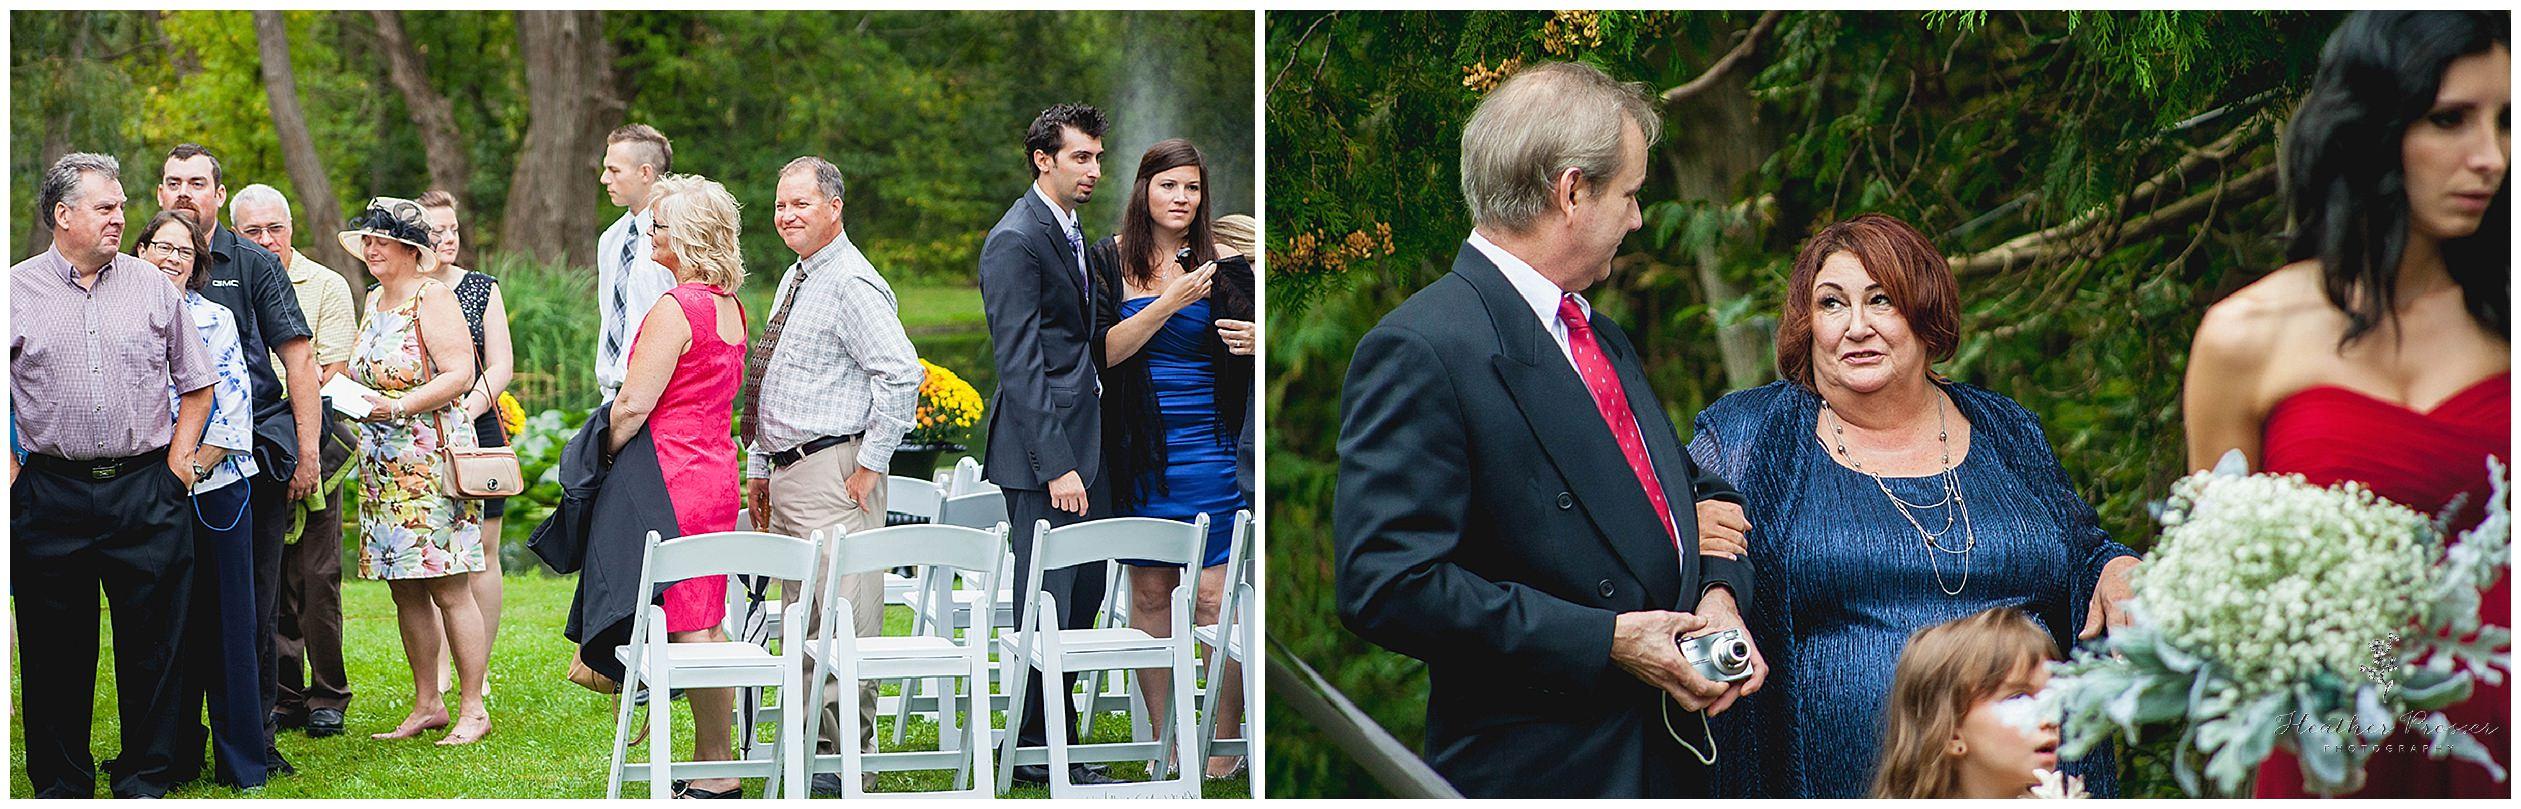 Bowmanville Wedding Photography_0207.jpg